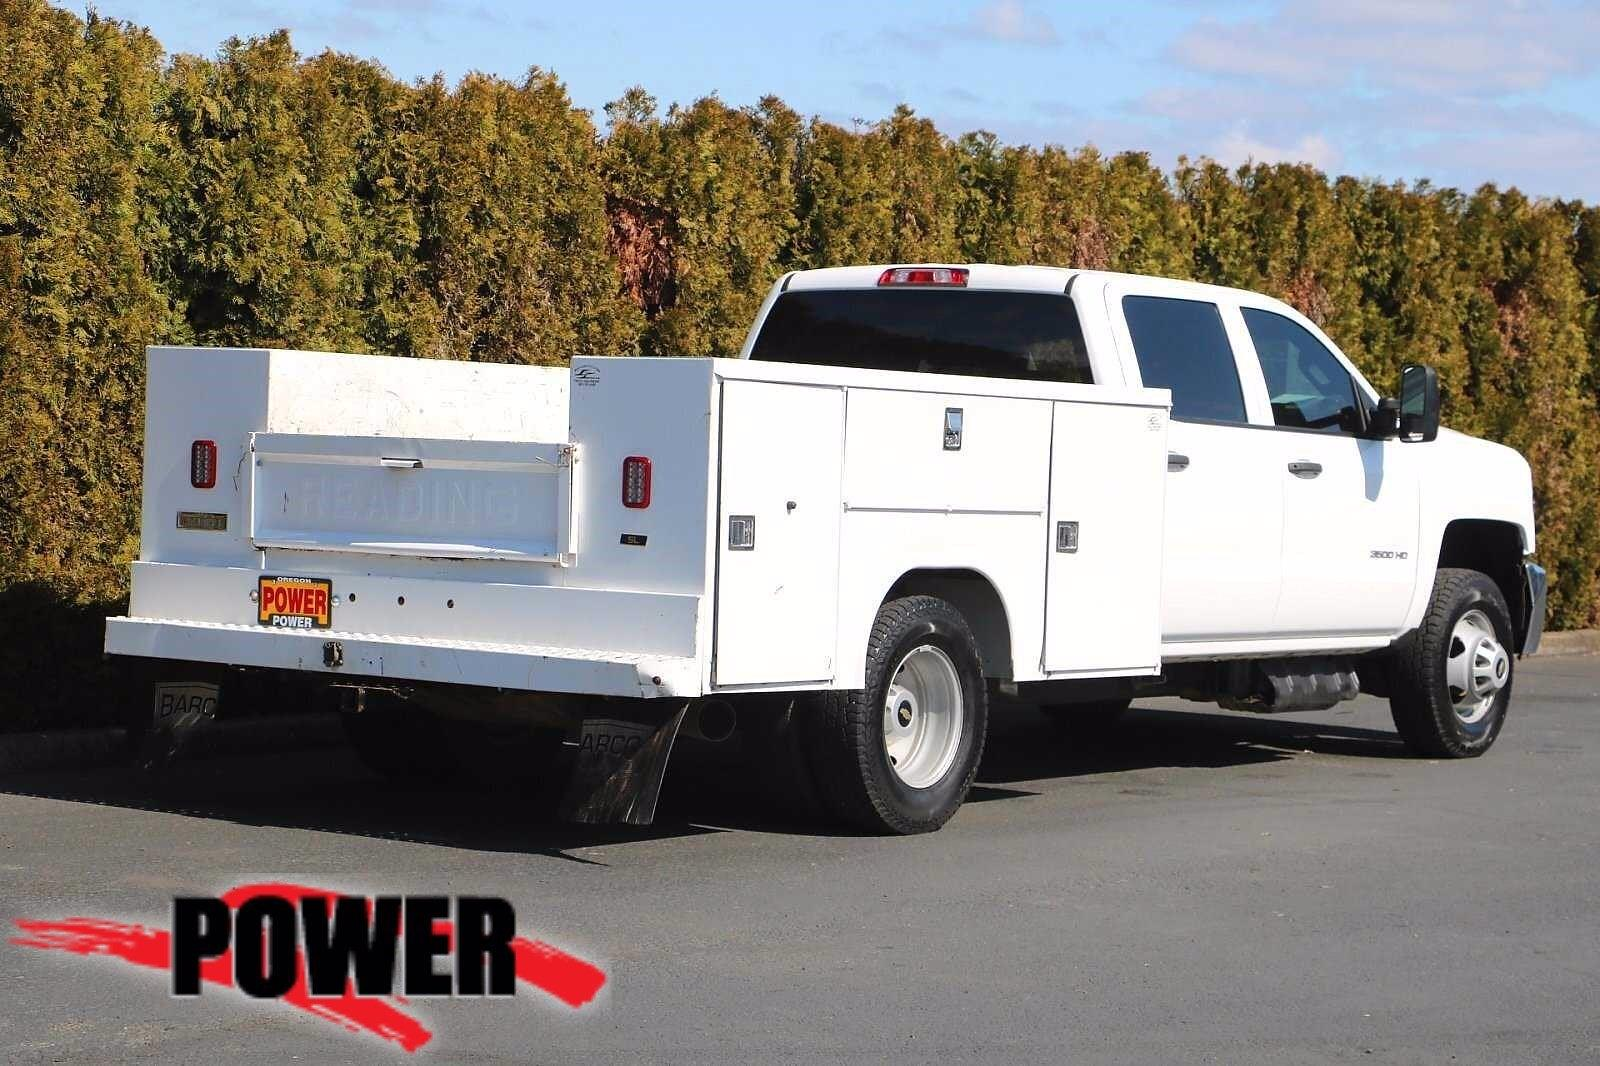 2019 Chevrolet Silverado 3500 Crew Cab DRW 4x4, Service Body #P28705 - photo 1